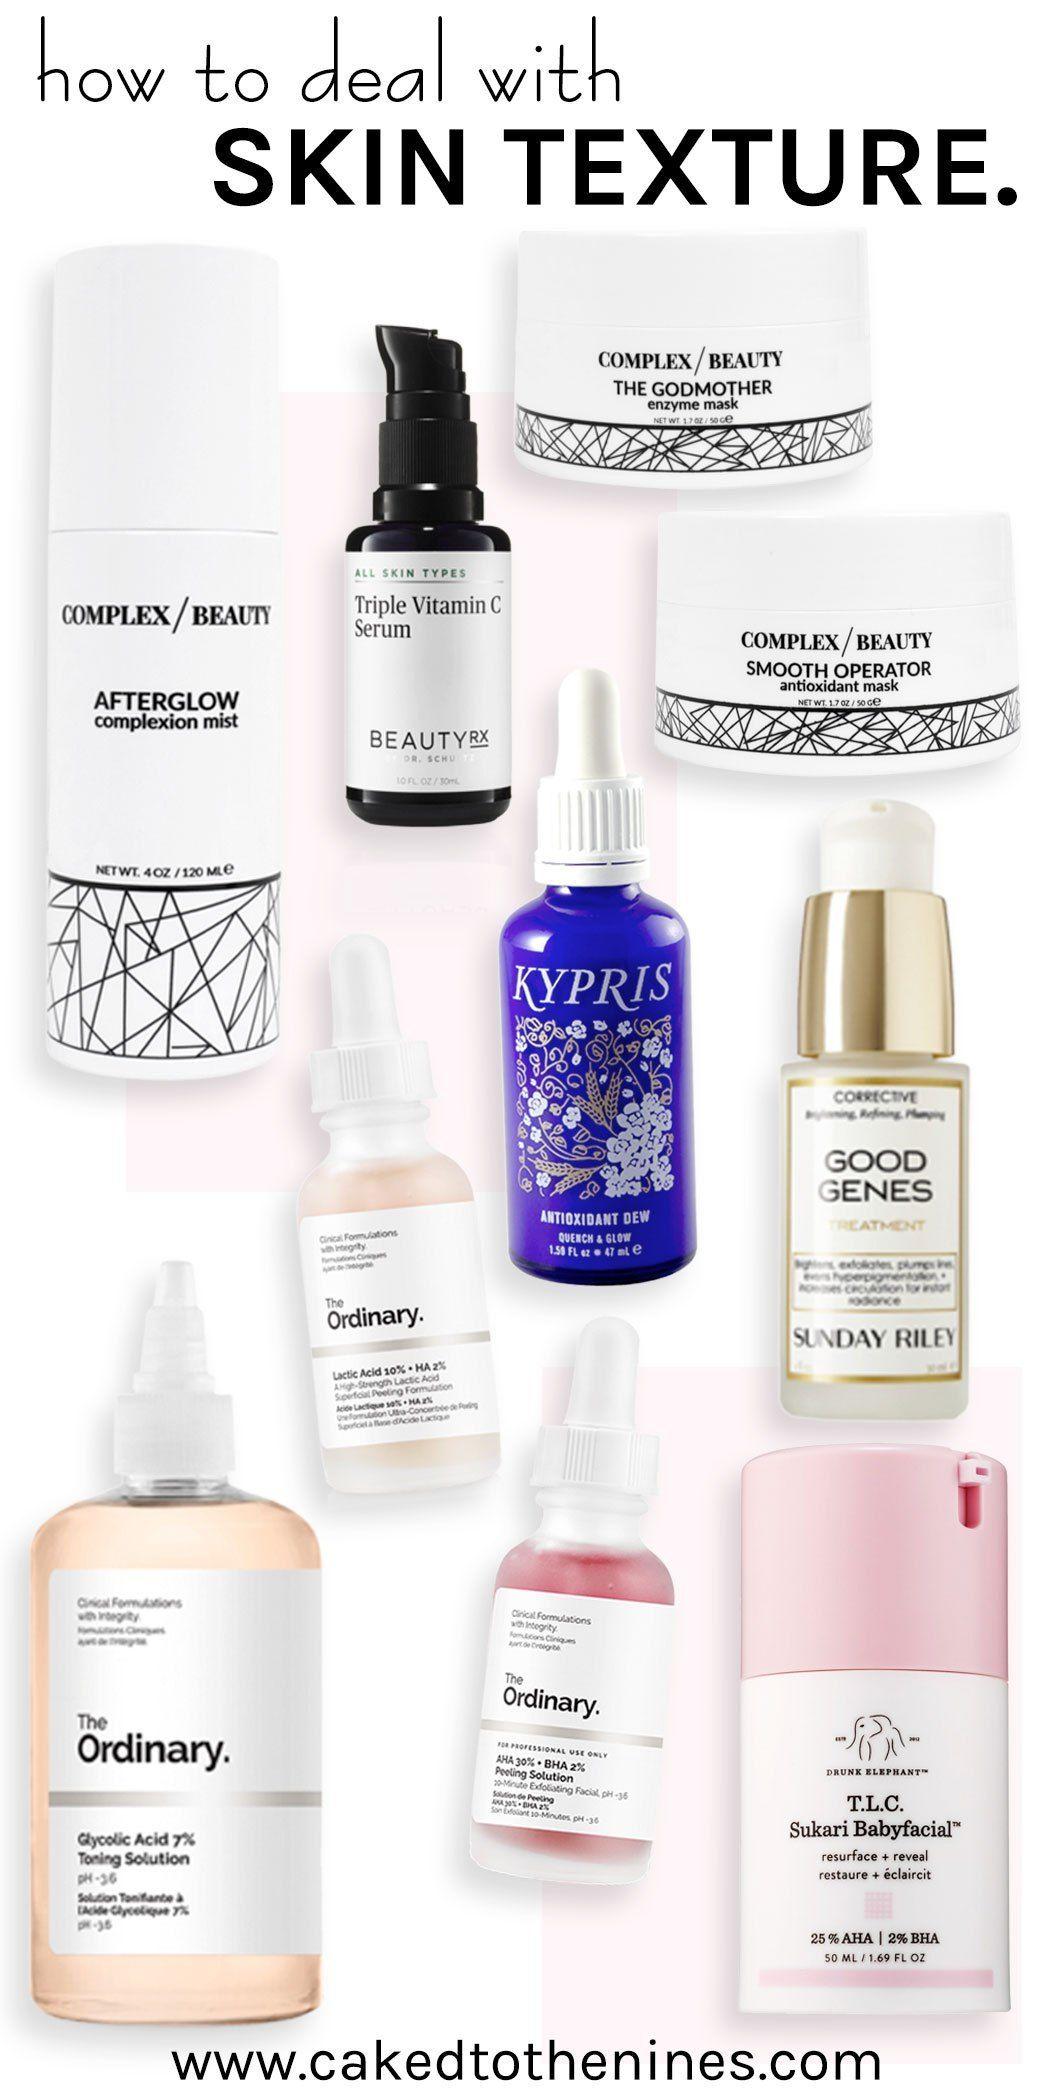 Skin Texture Sensitive skin care, Skin textures, Anti